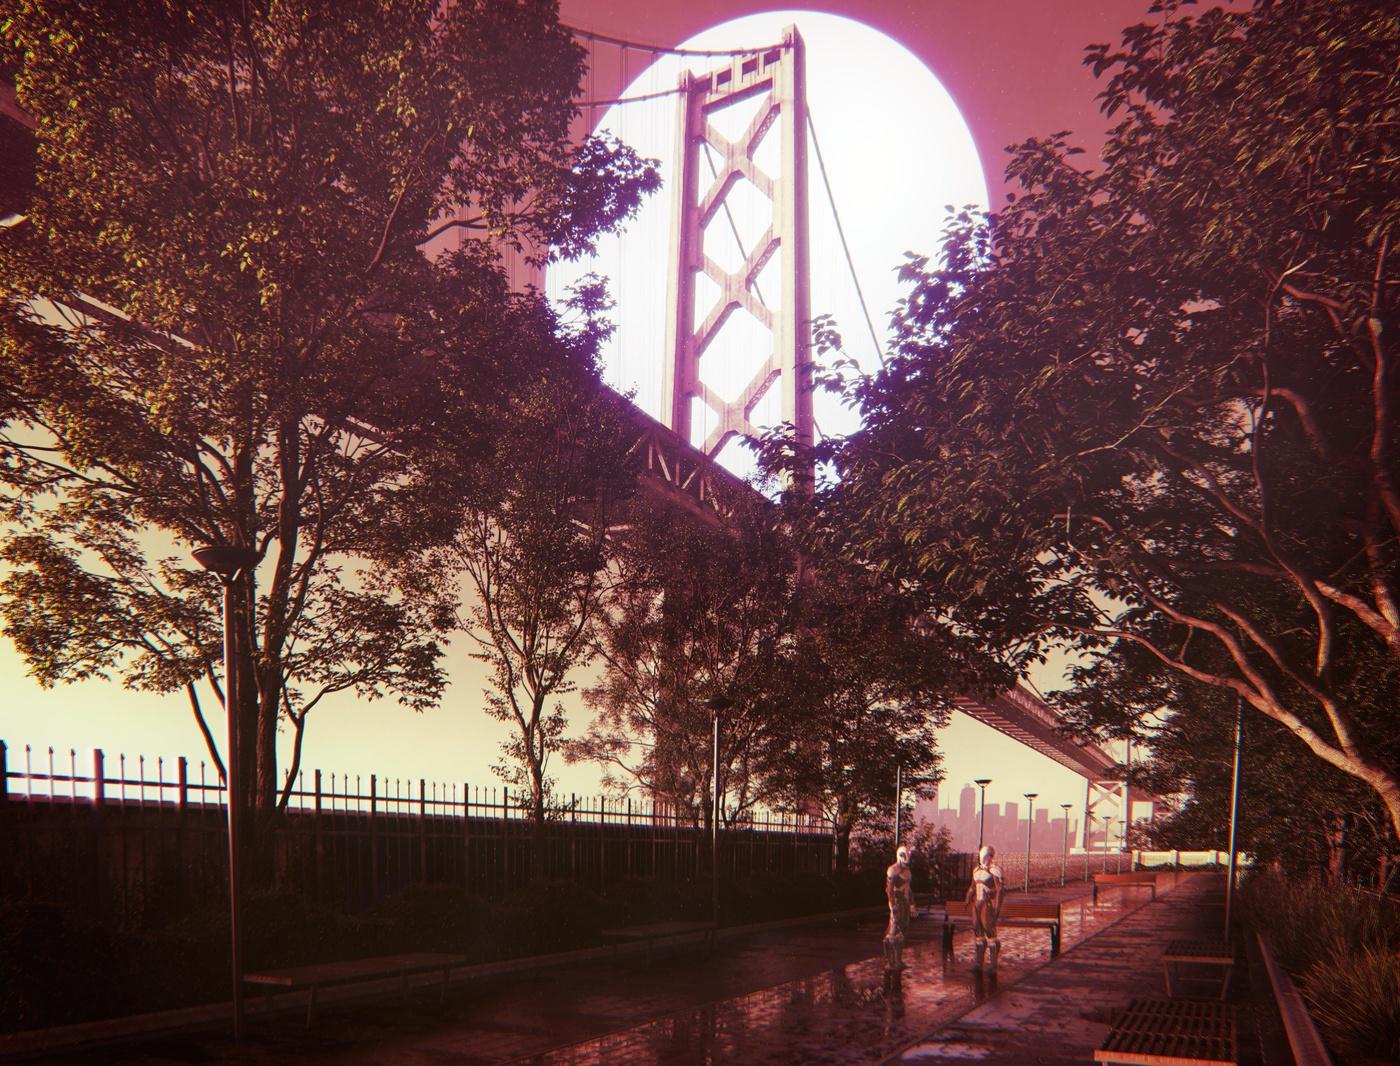 revealing lighting bridge trees nature scenery